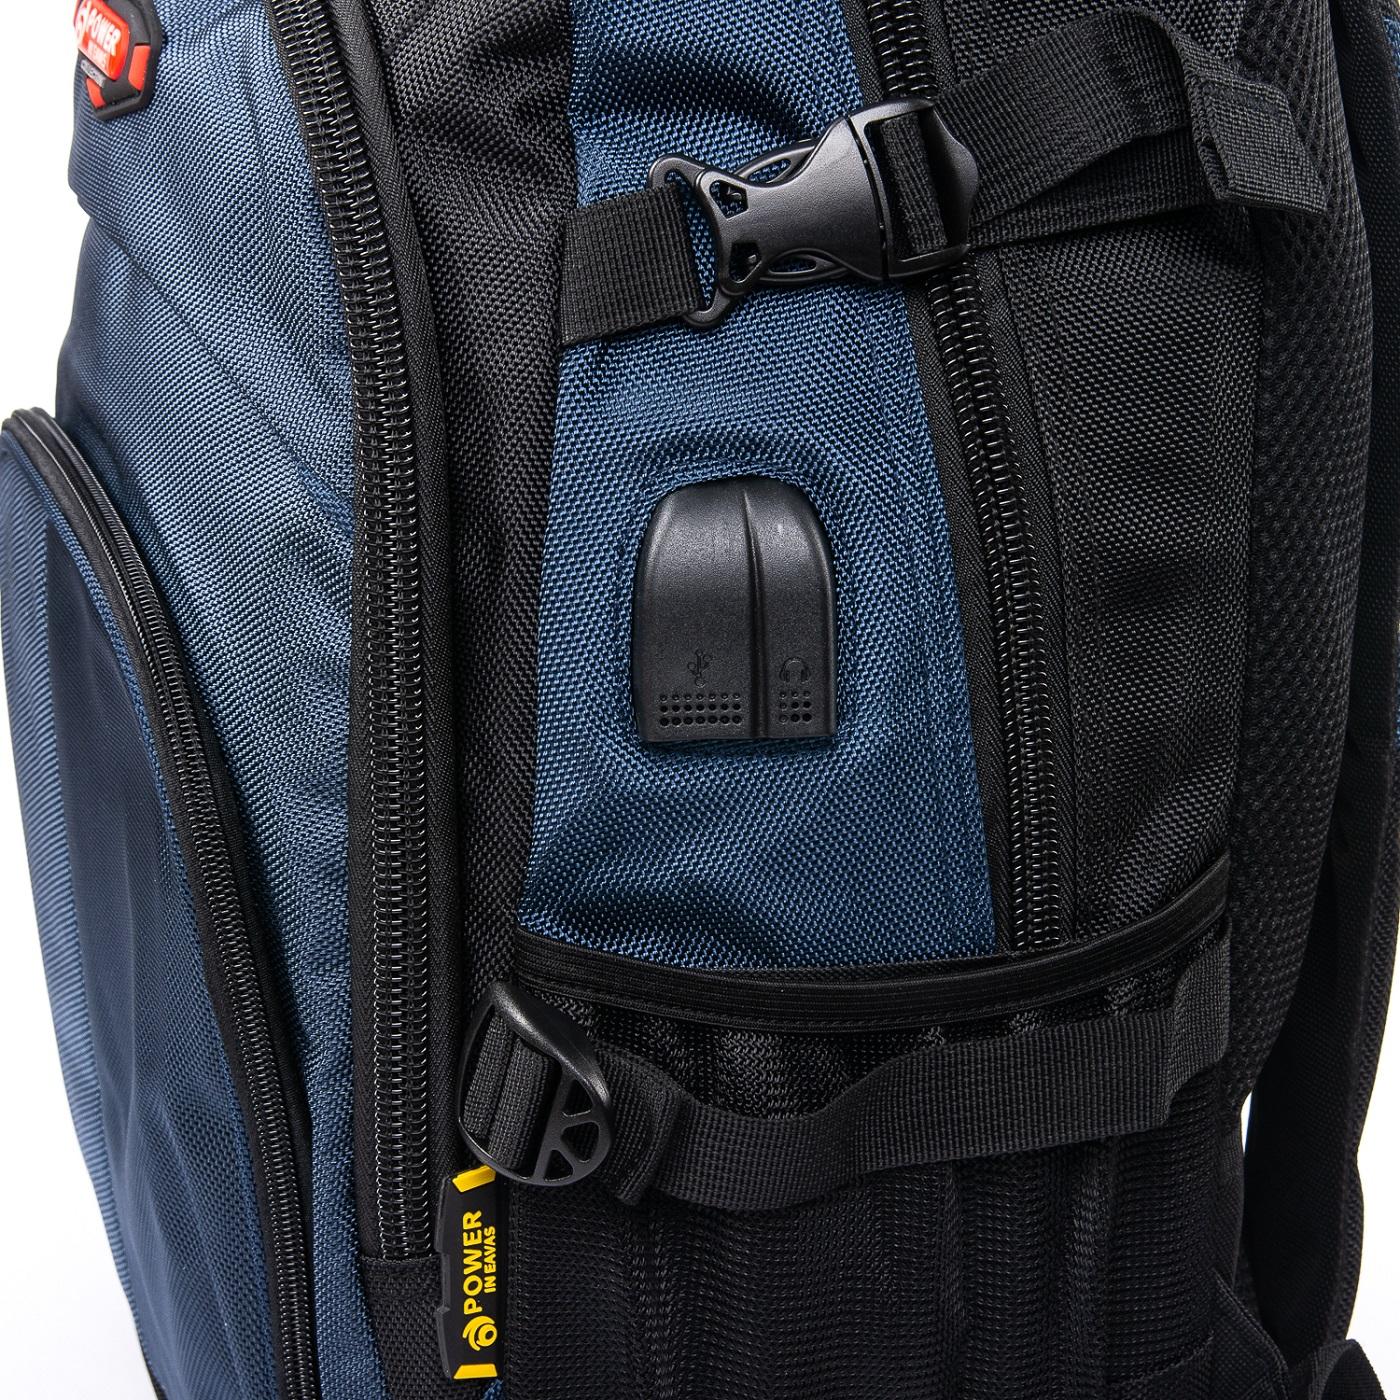 Рюкзак Городской нейлон Power In Eavas 9628 black-blue - фото 3